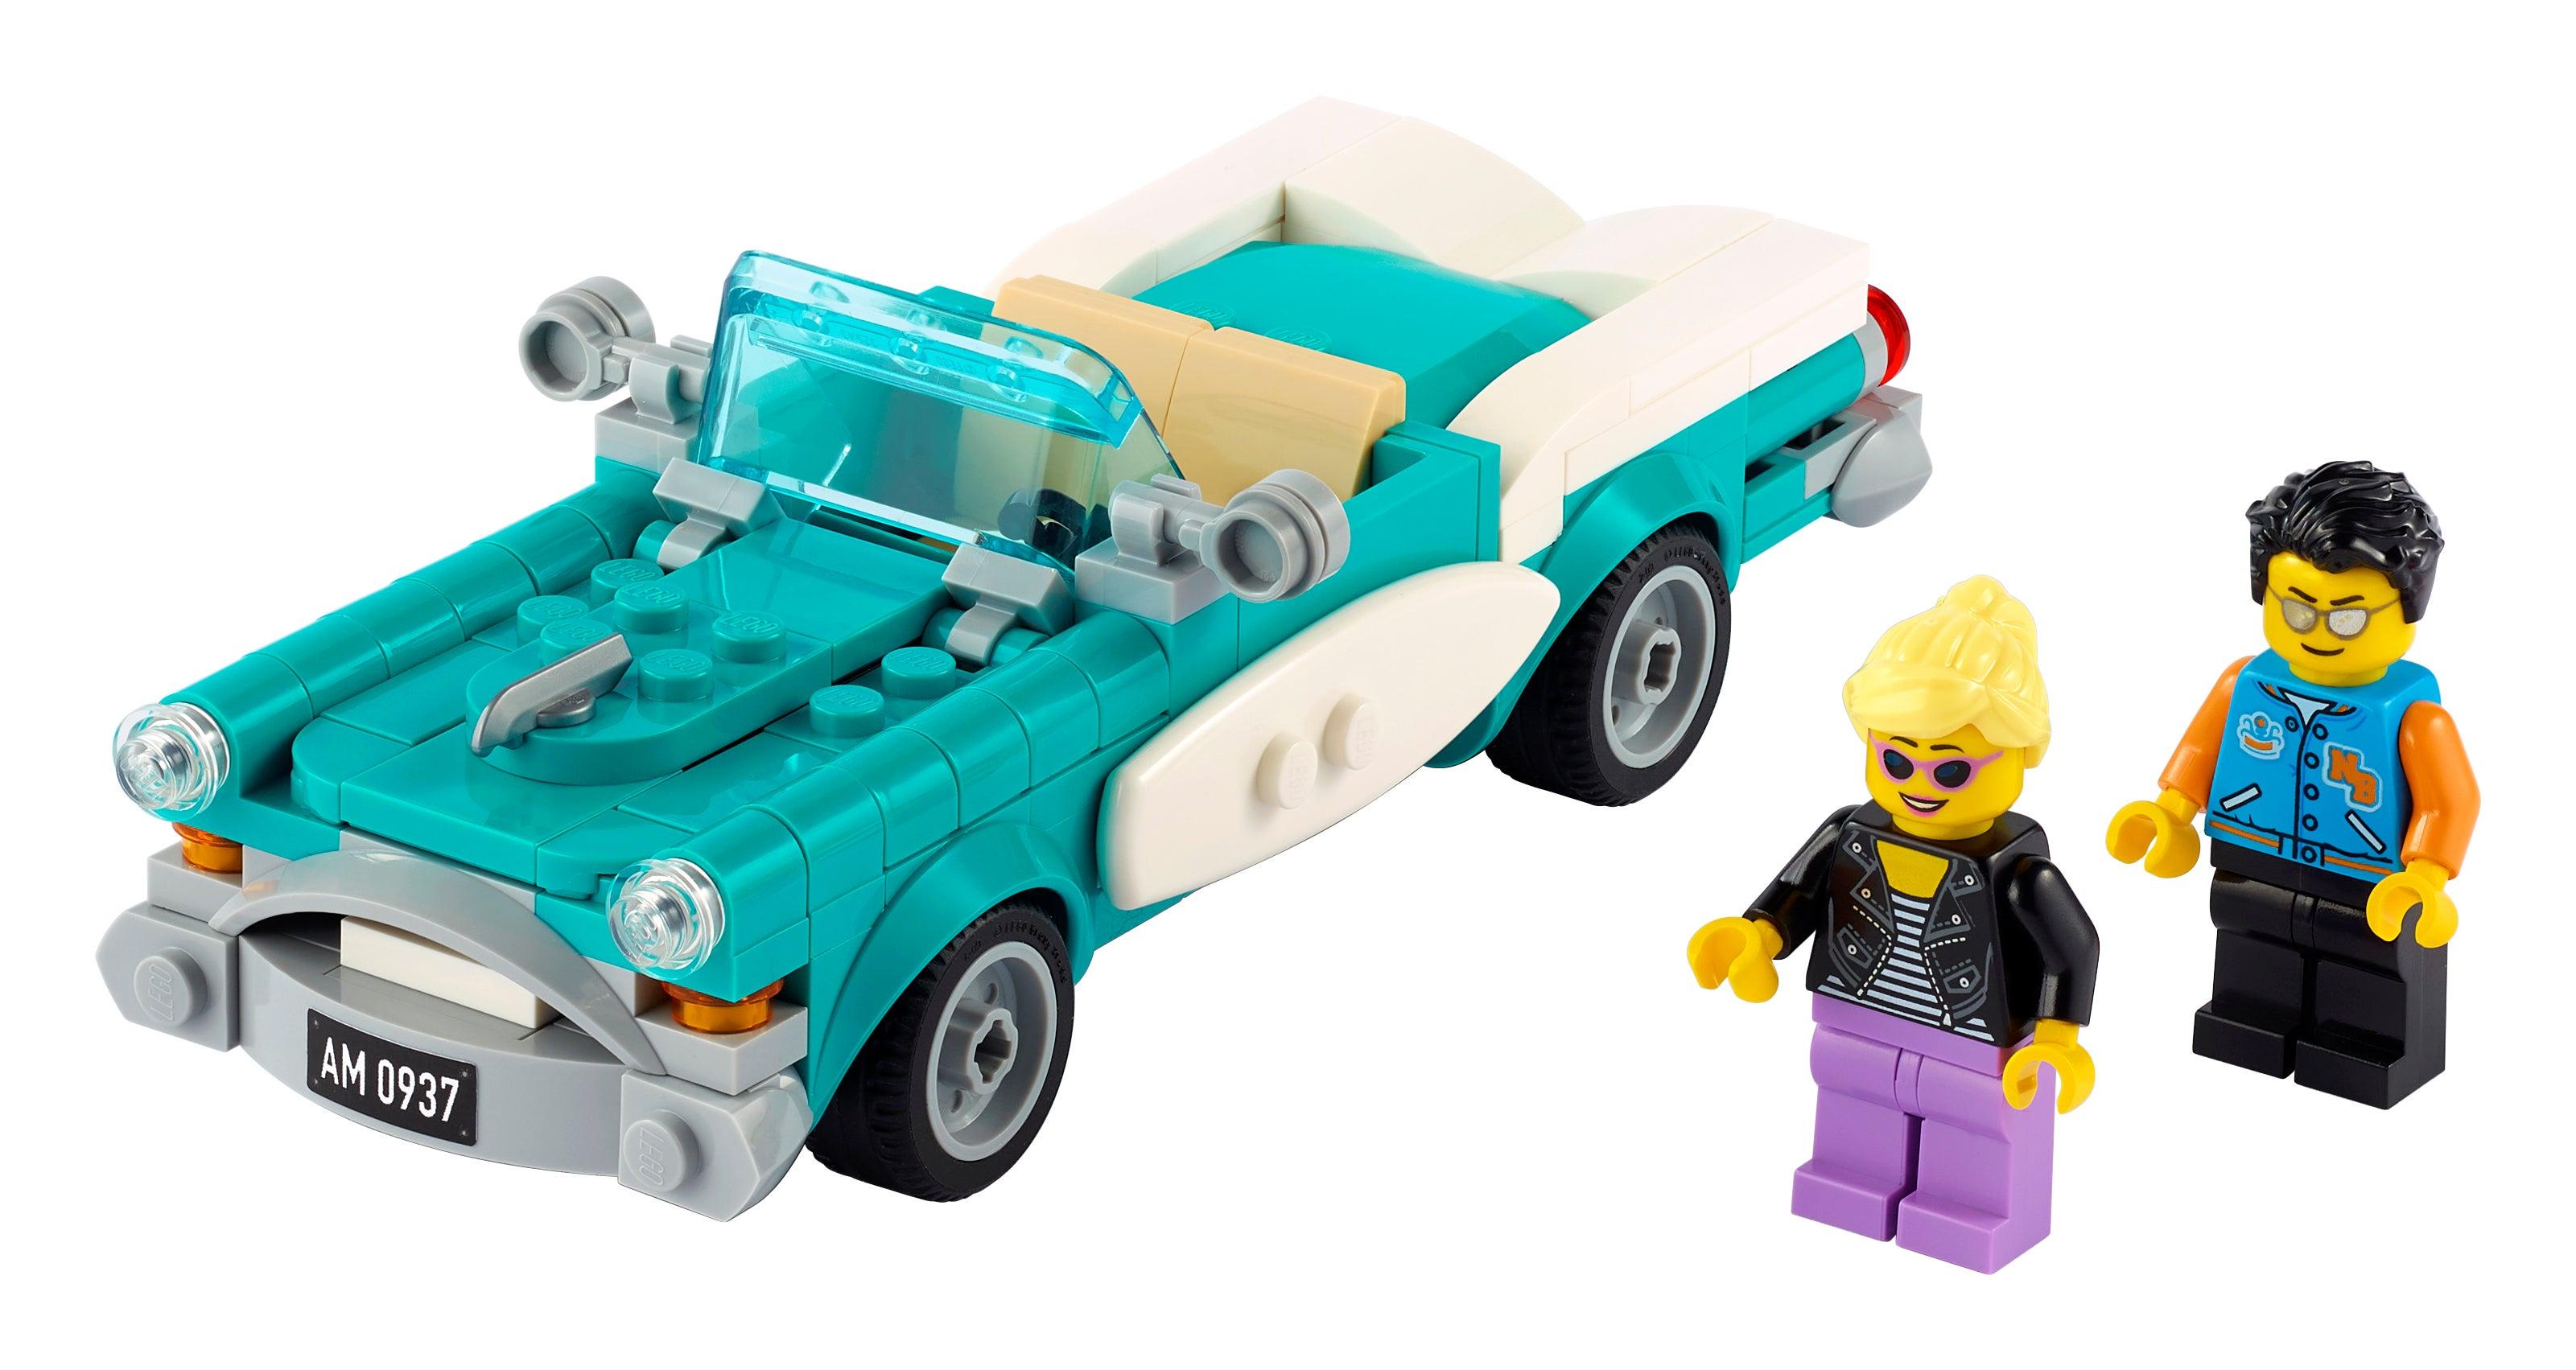 Set 585 370 575 400 396 368... 4 x Fenetre LEGO vintage Yellow window 3081cc01